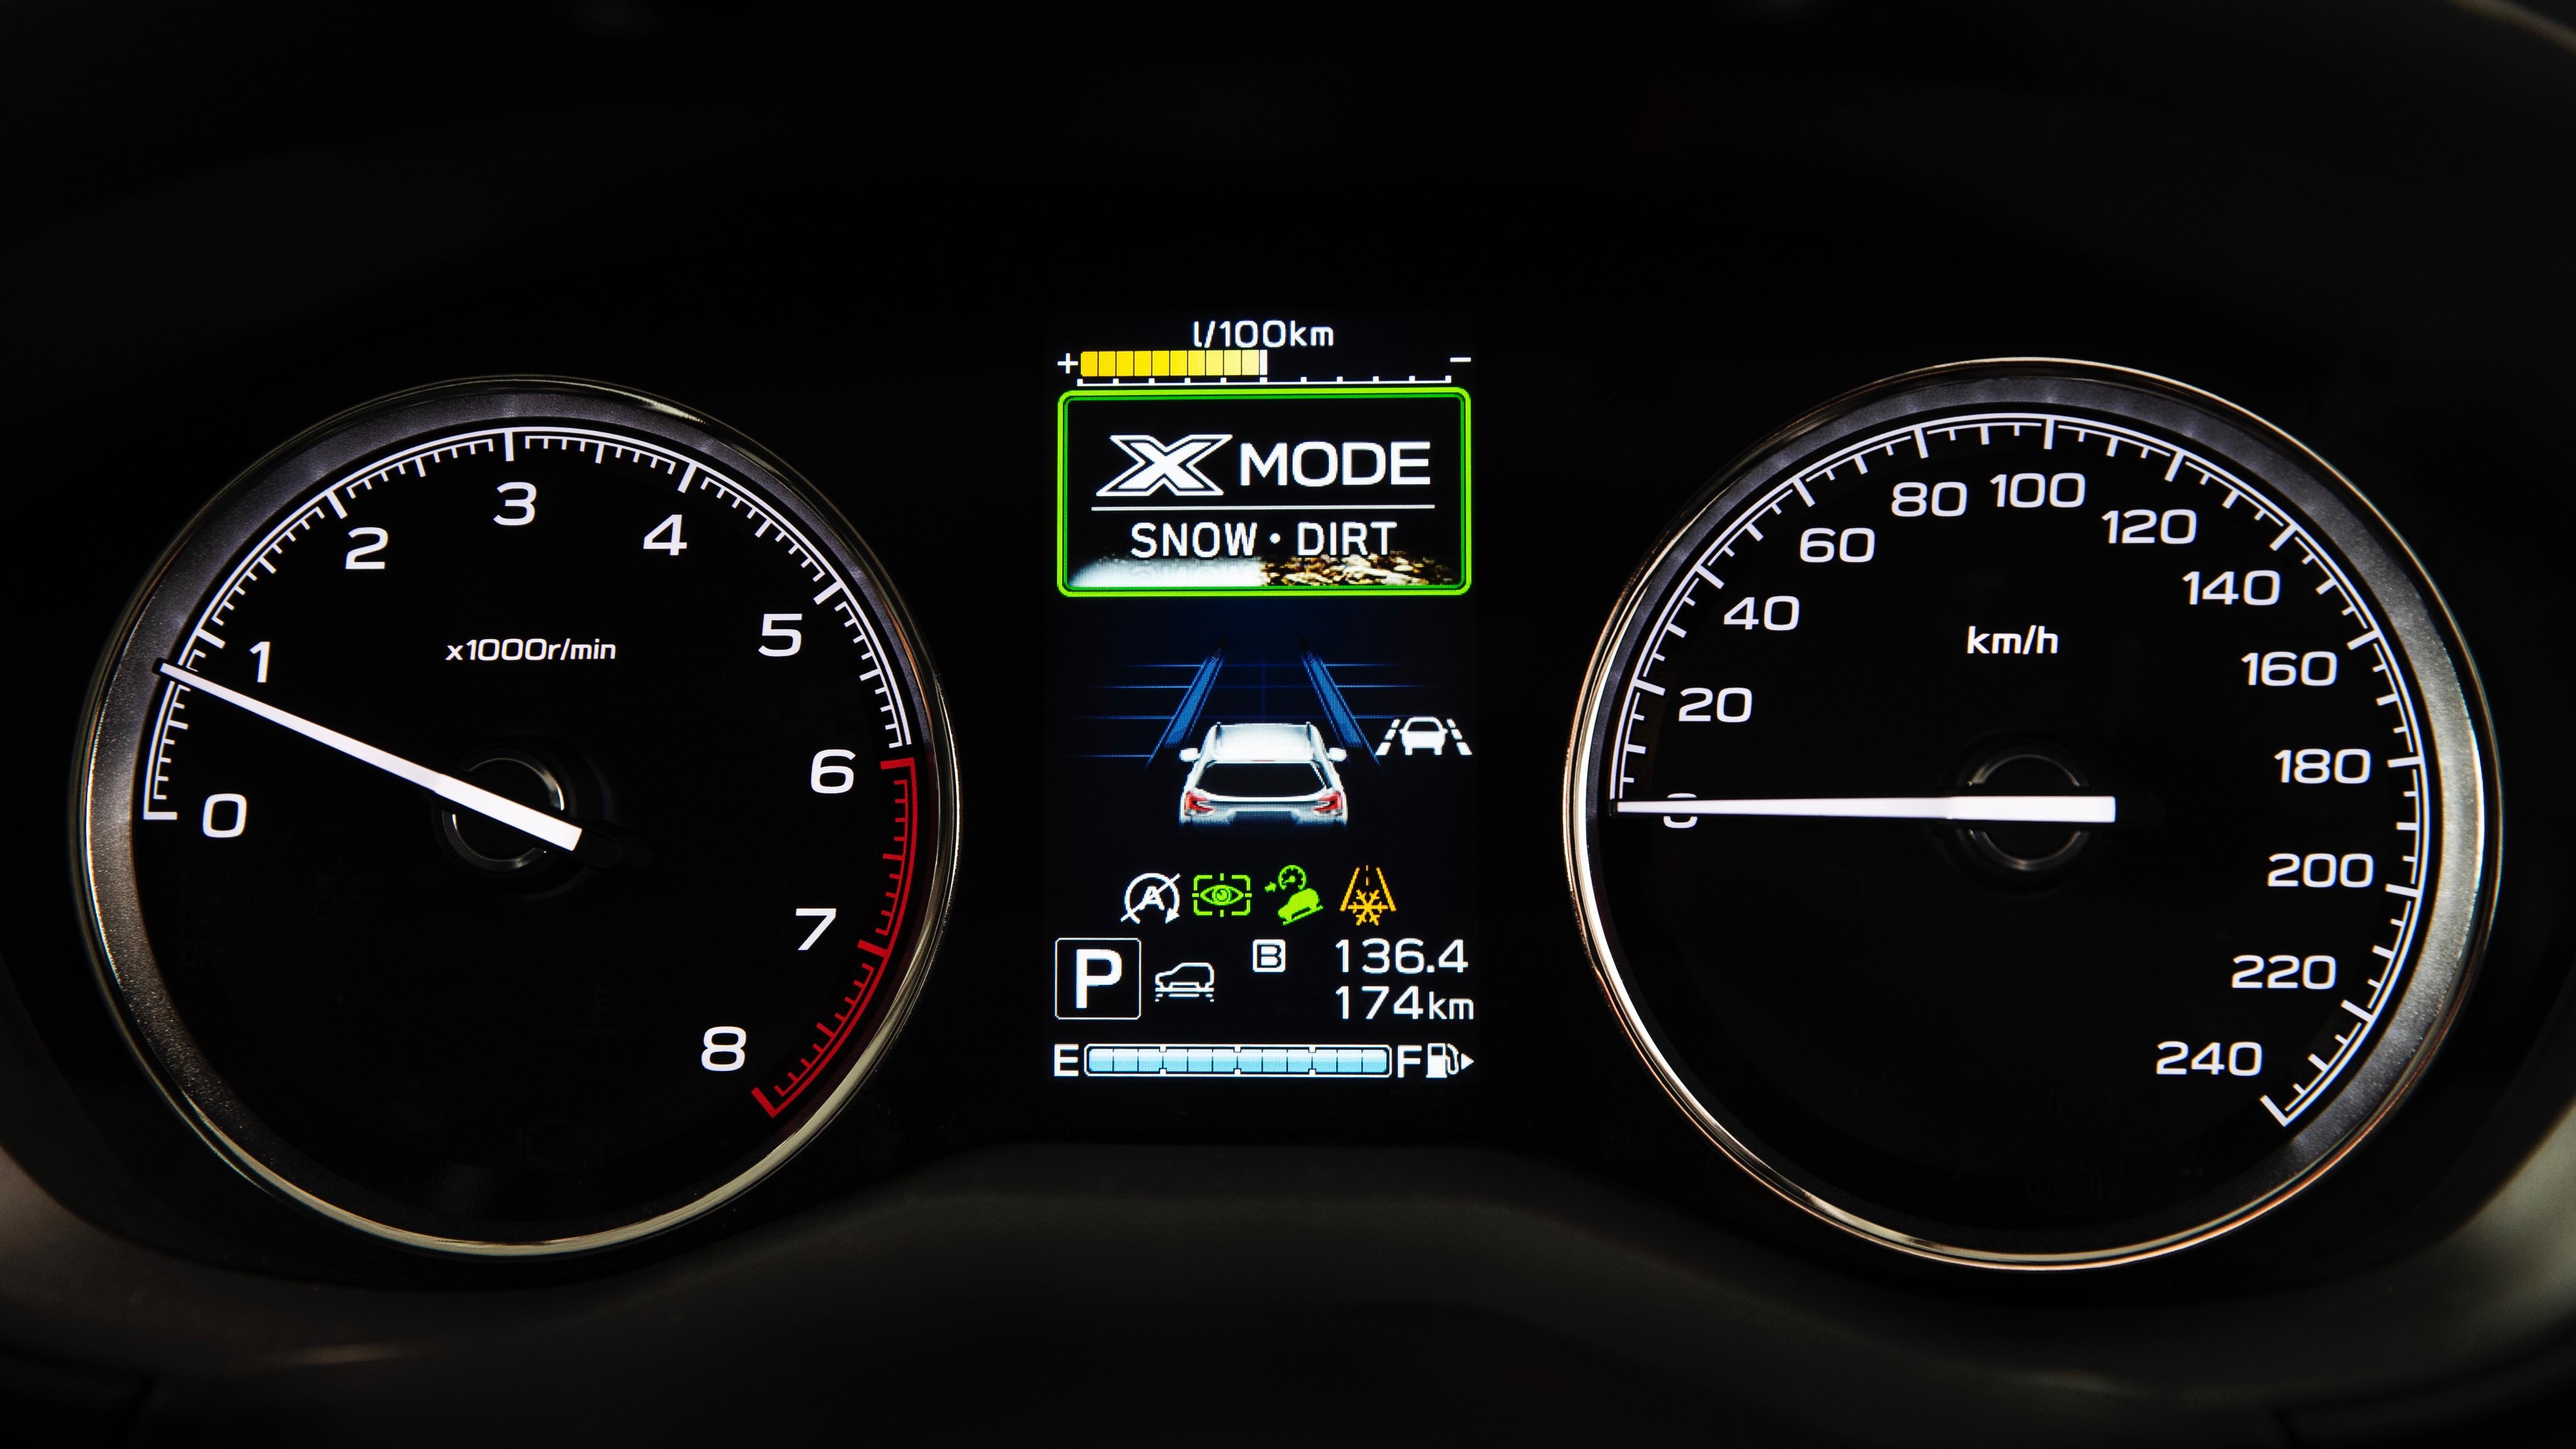 2019 Subaru Forester dials